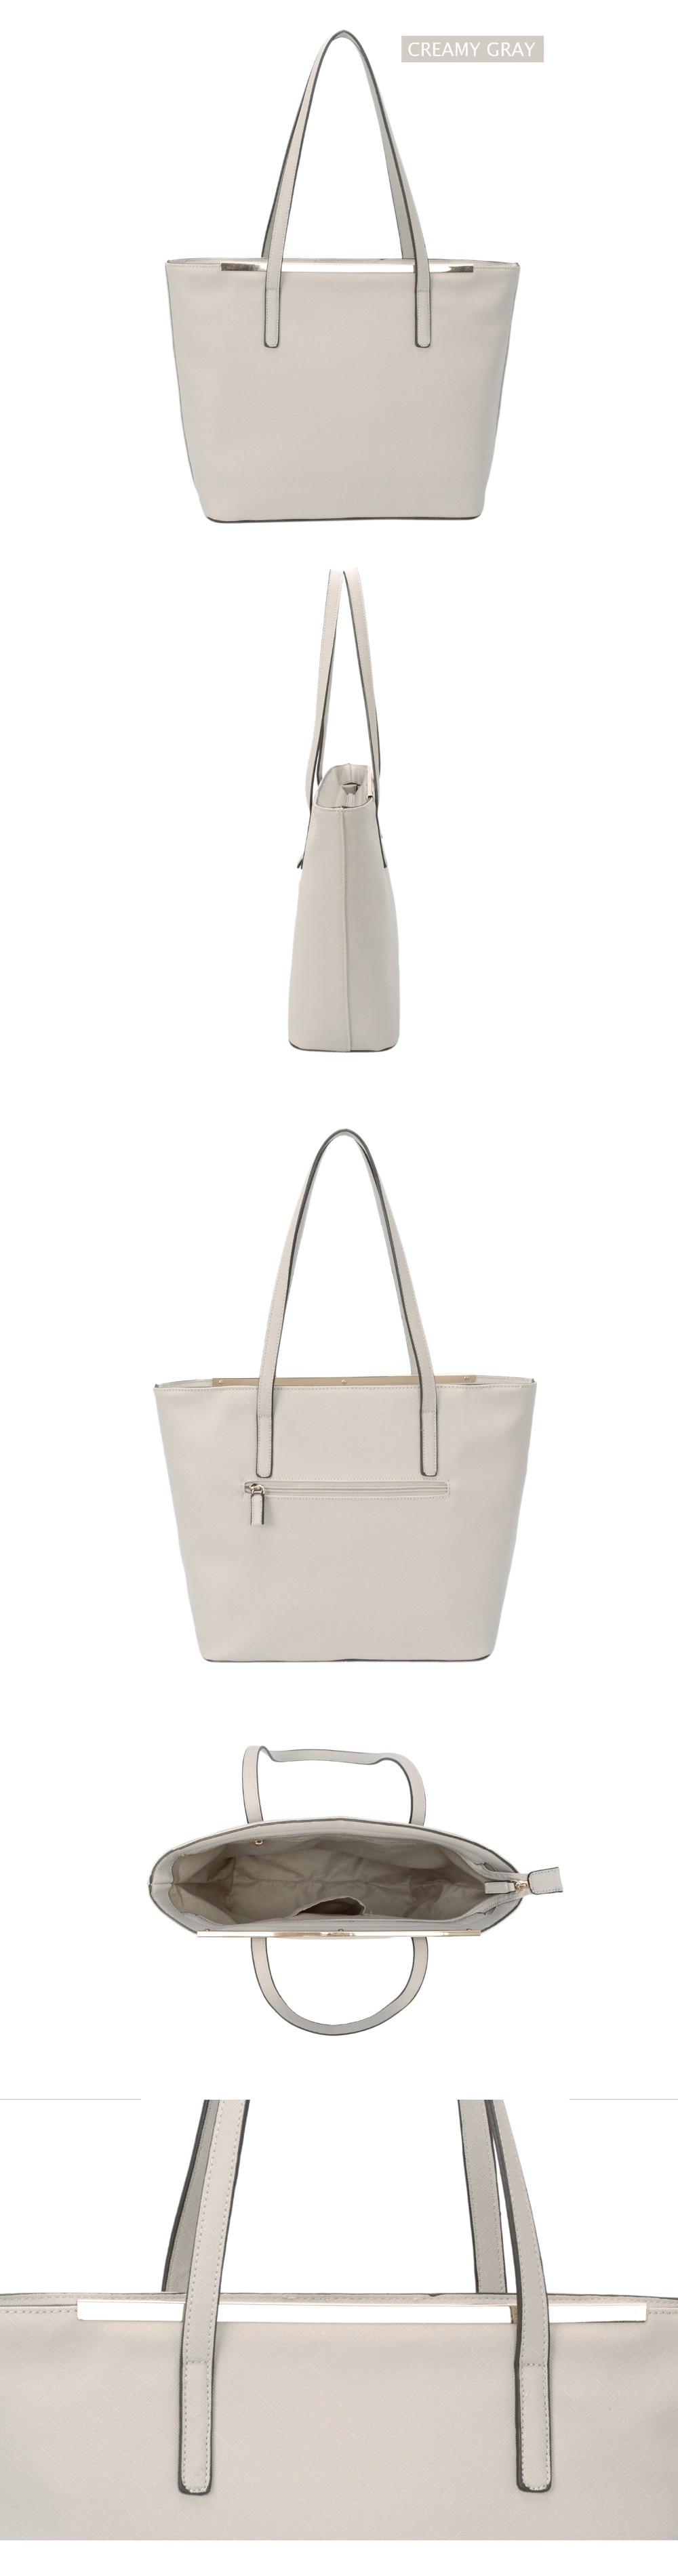 e982272b8eff DAVIDJONES Tote Bag Women Female PU Shoulder Bags Handbag Top Handle ...